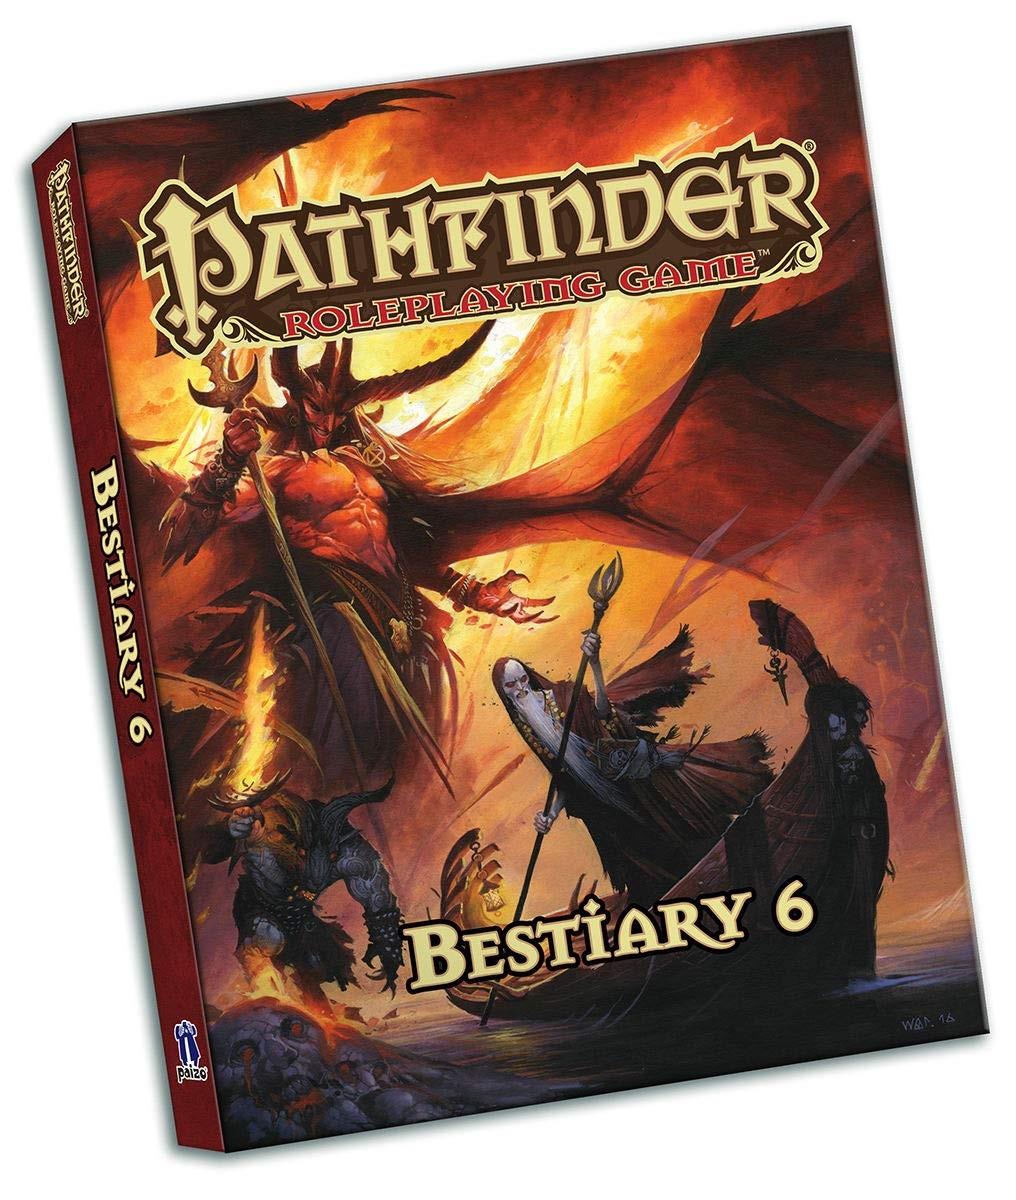 Pathfinder RPG - Bestiary 6 (Pocket Edition)